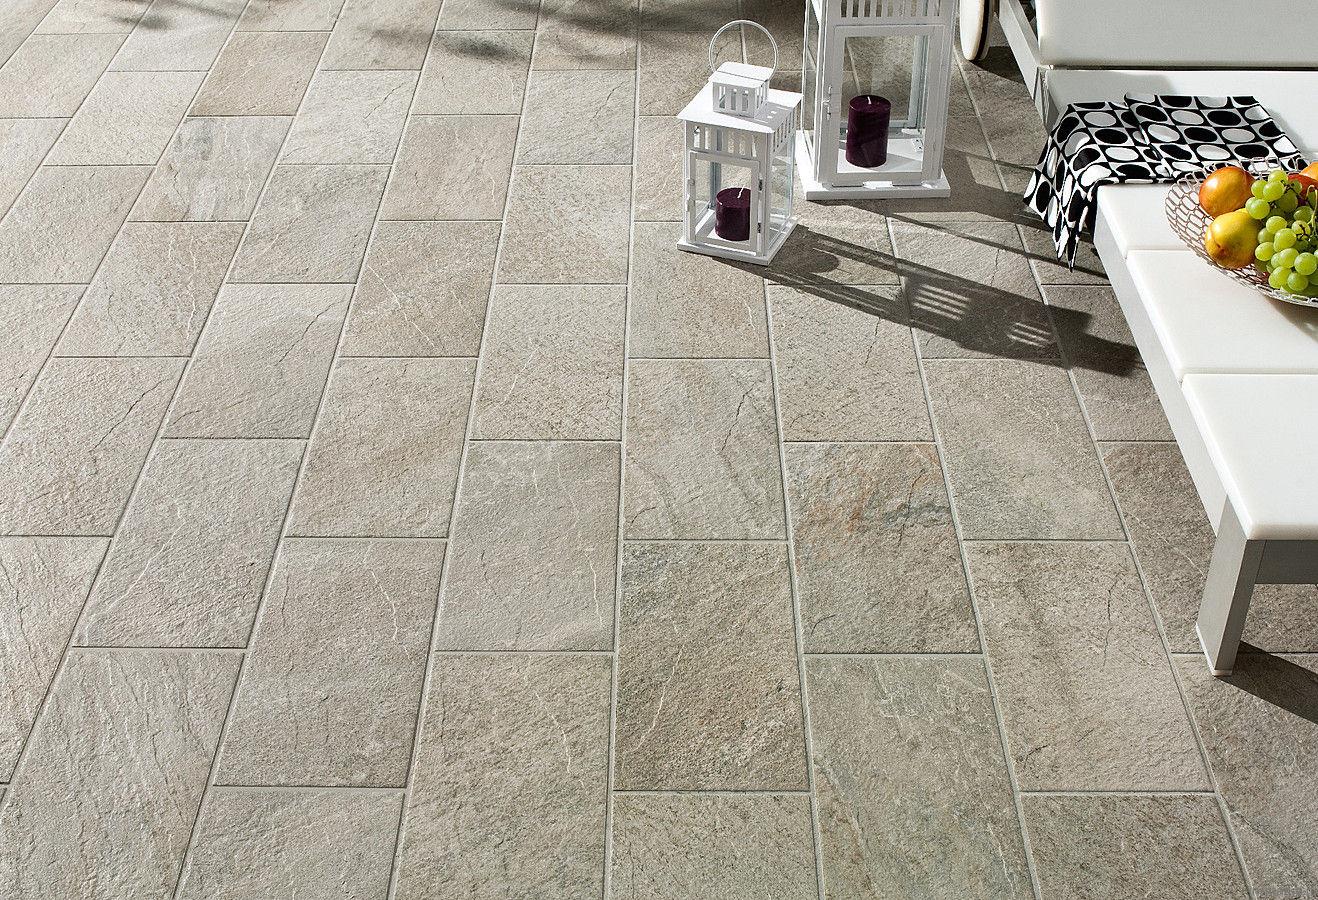 Outdoor stone tile flooring